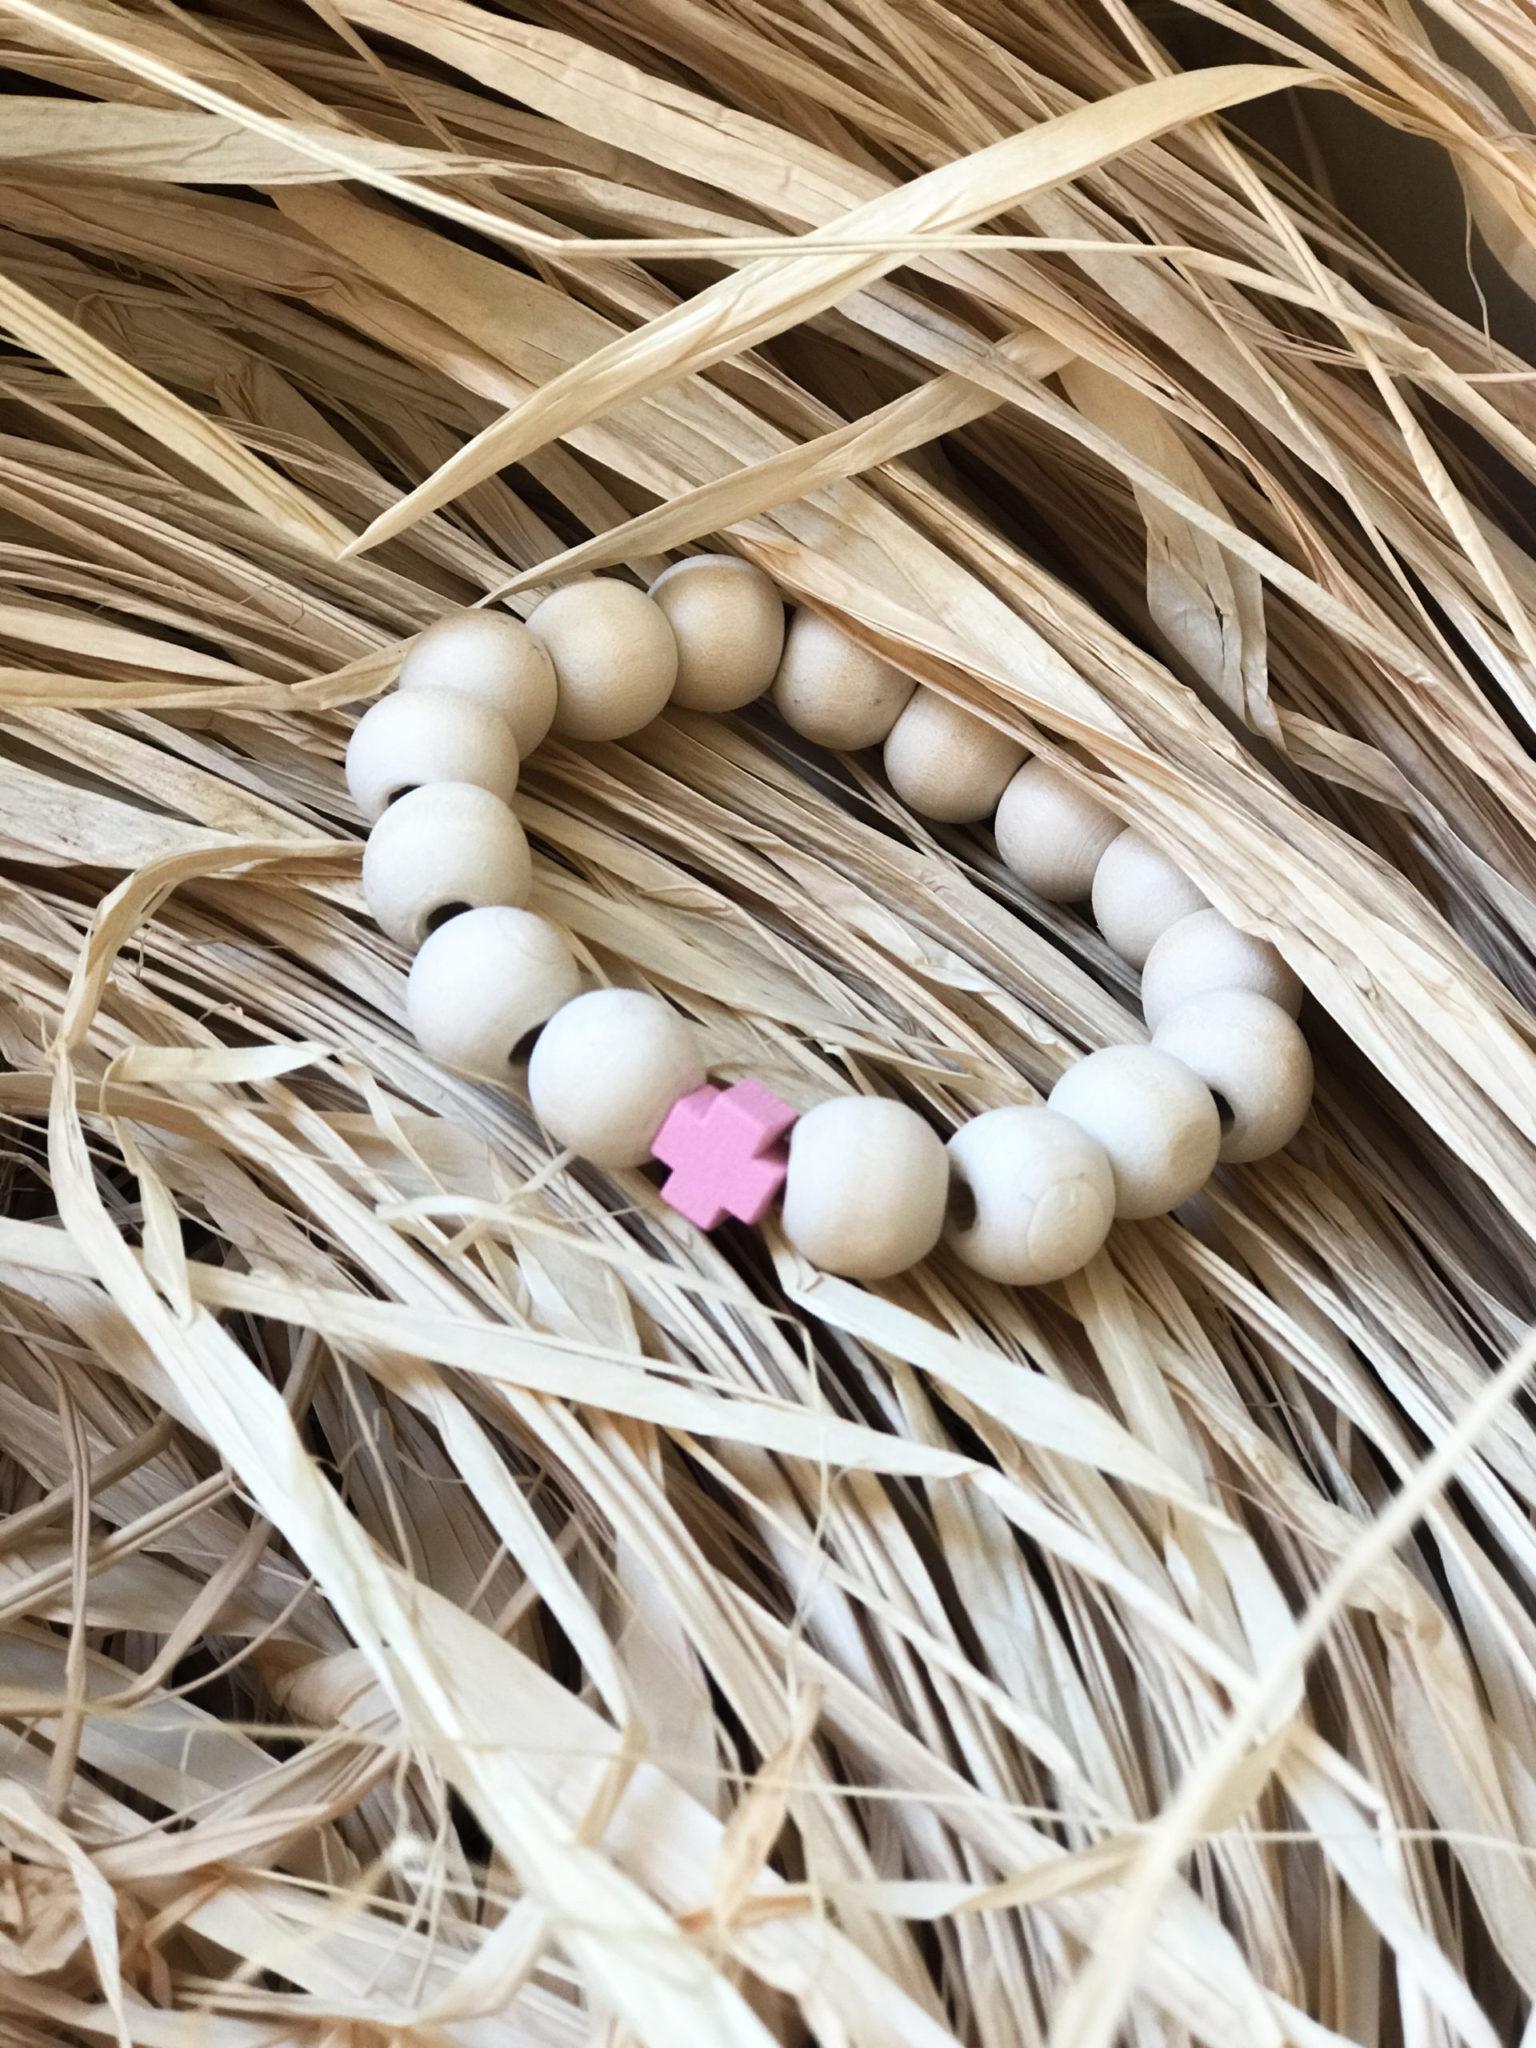 little-bunny-baptism-witness-bracelet-wooden-pebbles